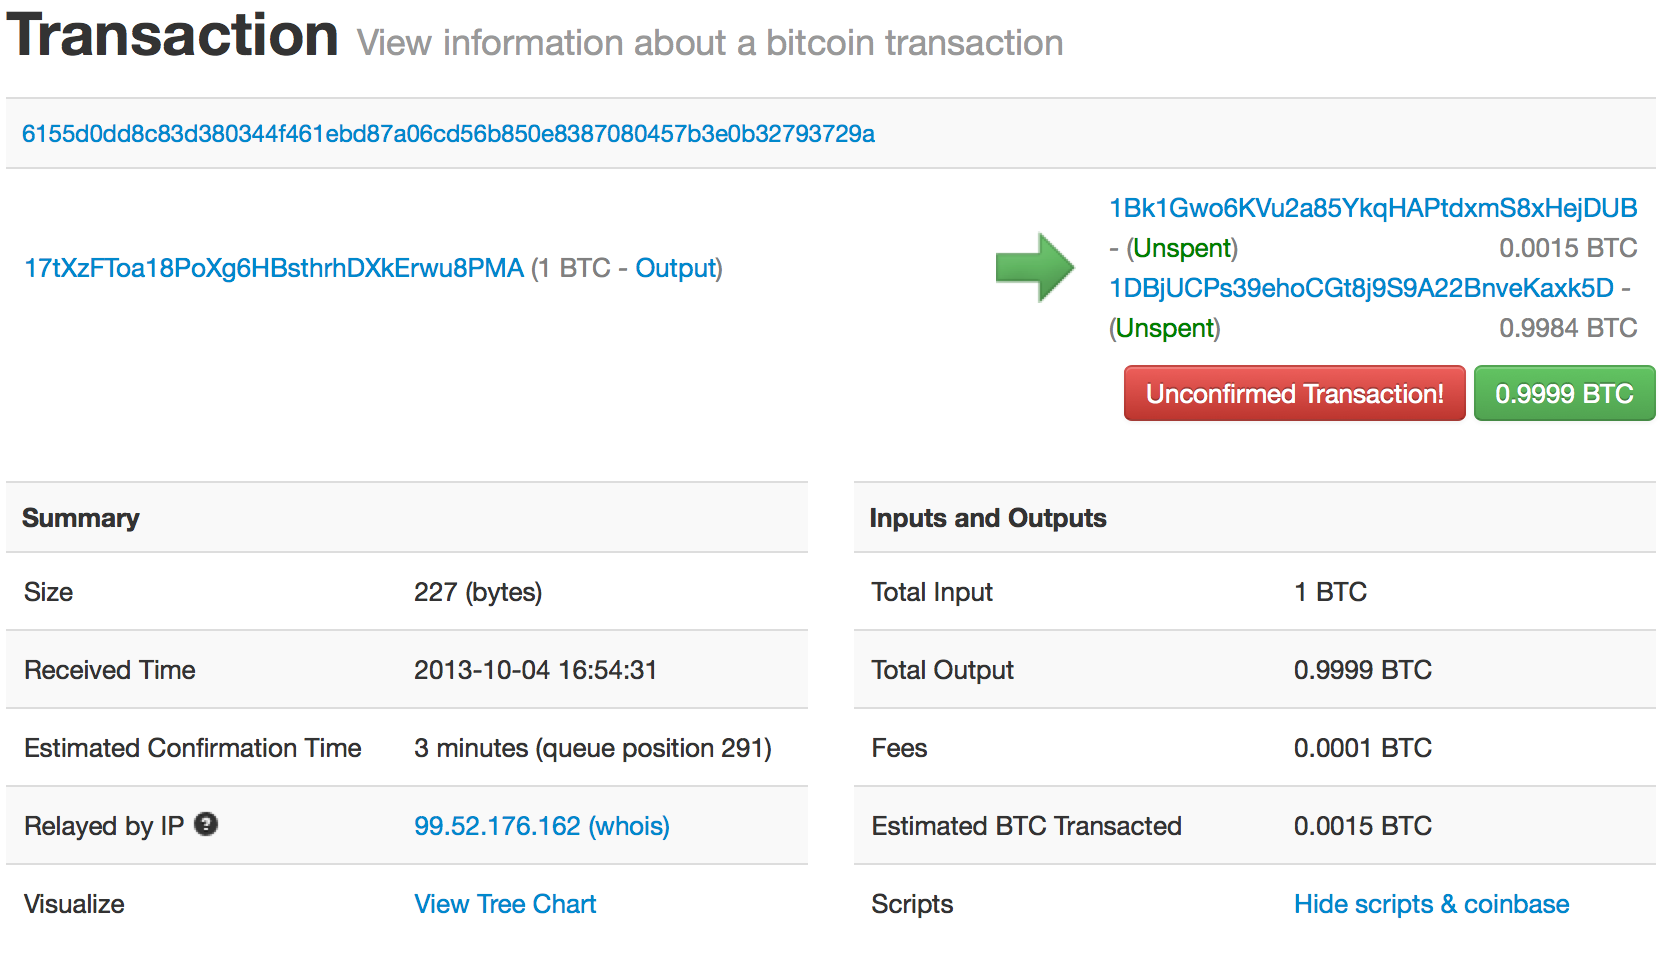 https://raw.github.com/miohtama/django-bitcoin-example/master/images/blockchain.png